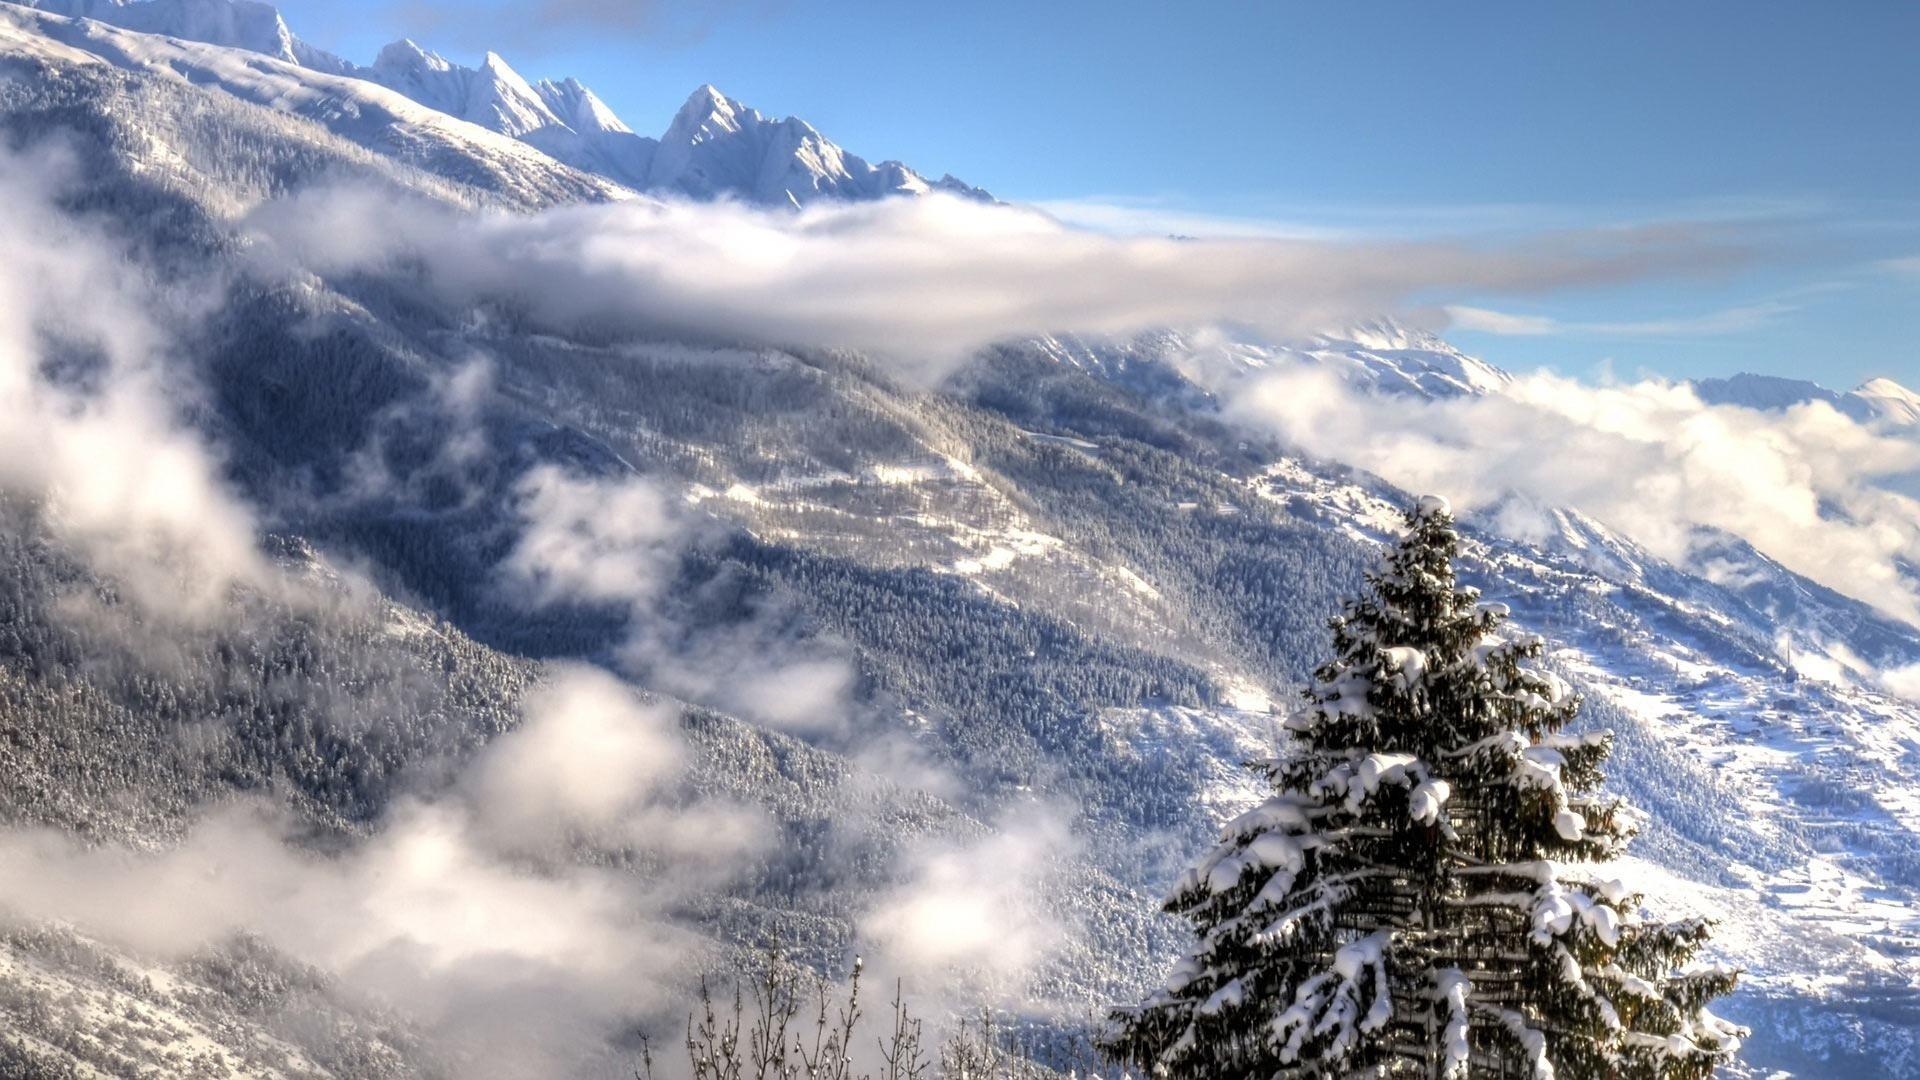 Wallpapers Backgrounds – Desktop backgrounds Animal Life Nature Winter Alps